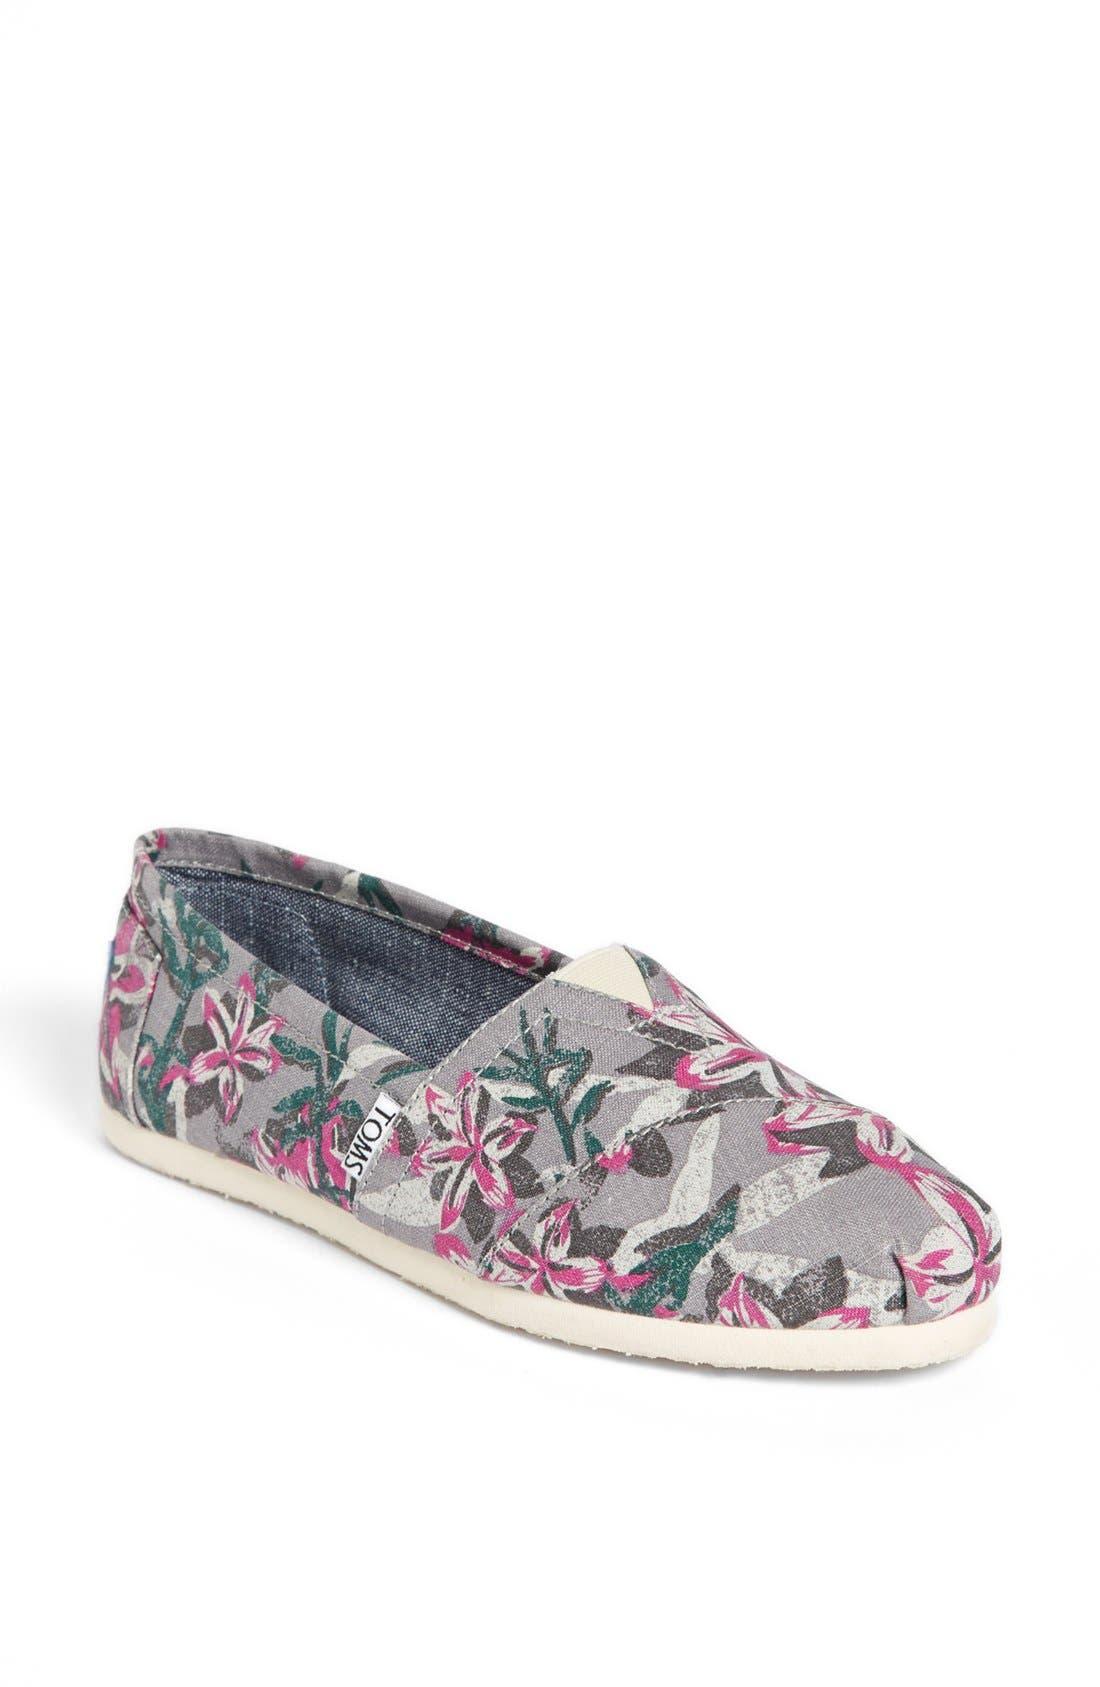 Main Image - TOMS 'Classic - Grey Floral' Vegan Slip-On (Women)